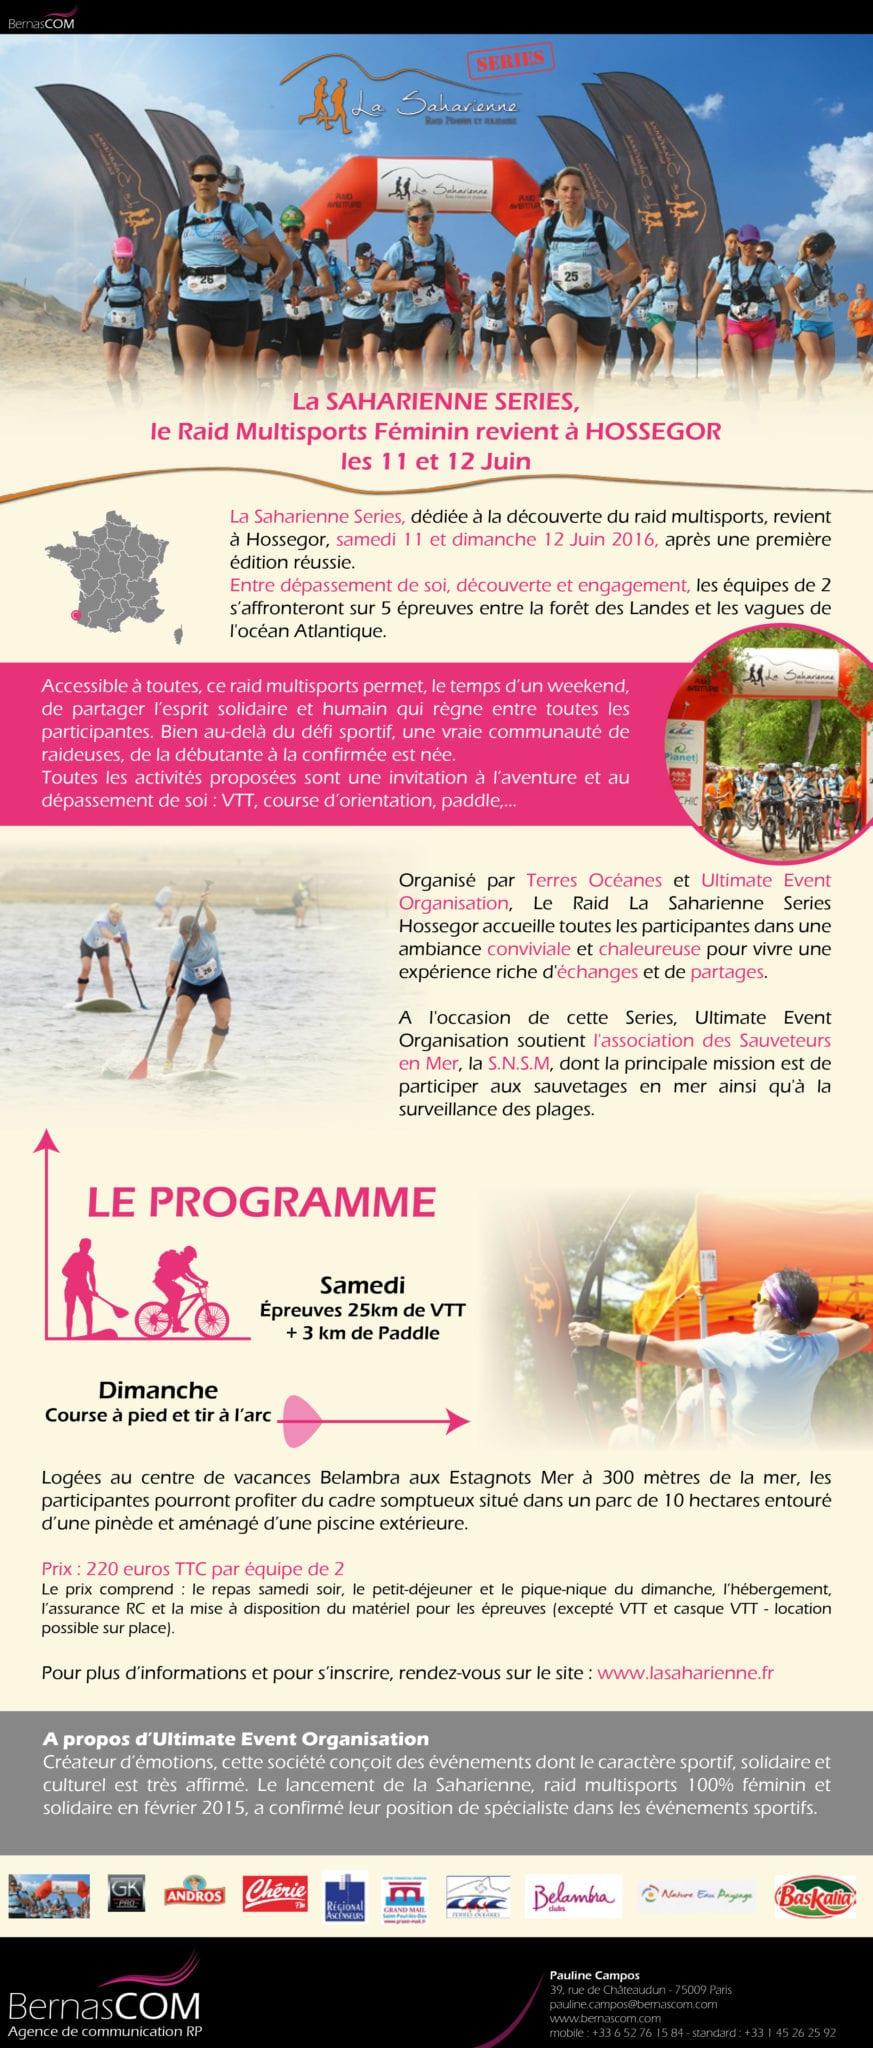 LASAHARIENNE-CP_Saharienne Series Hossegor